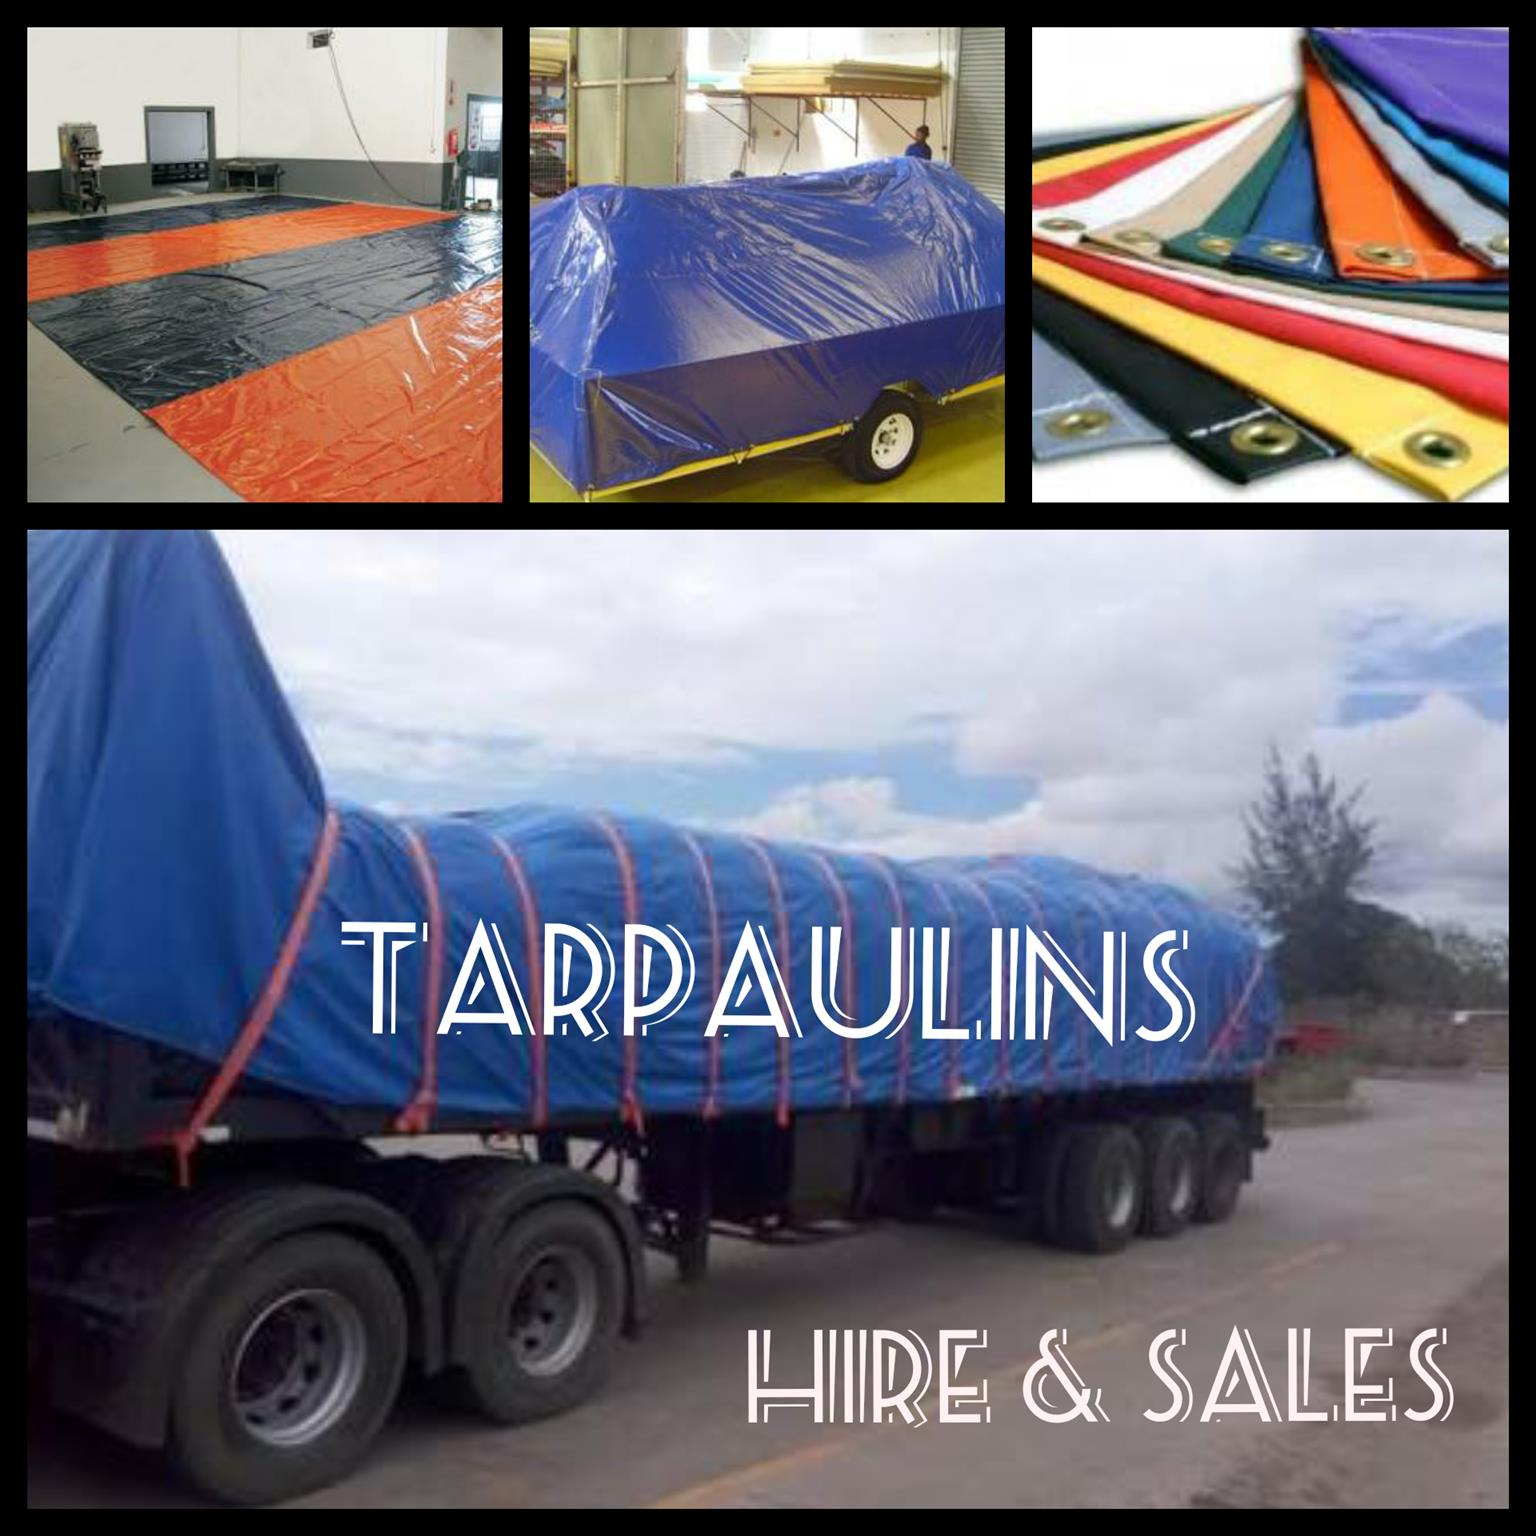 TENTS - TARPS - JUMPING CASTLES